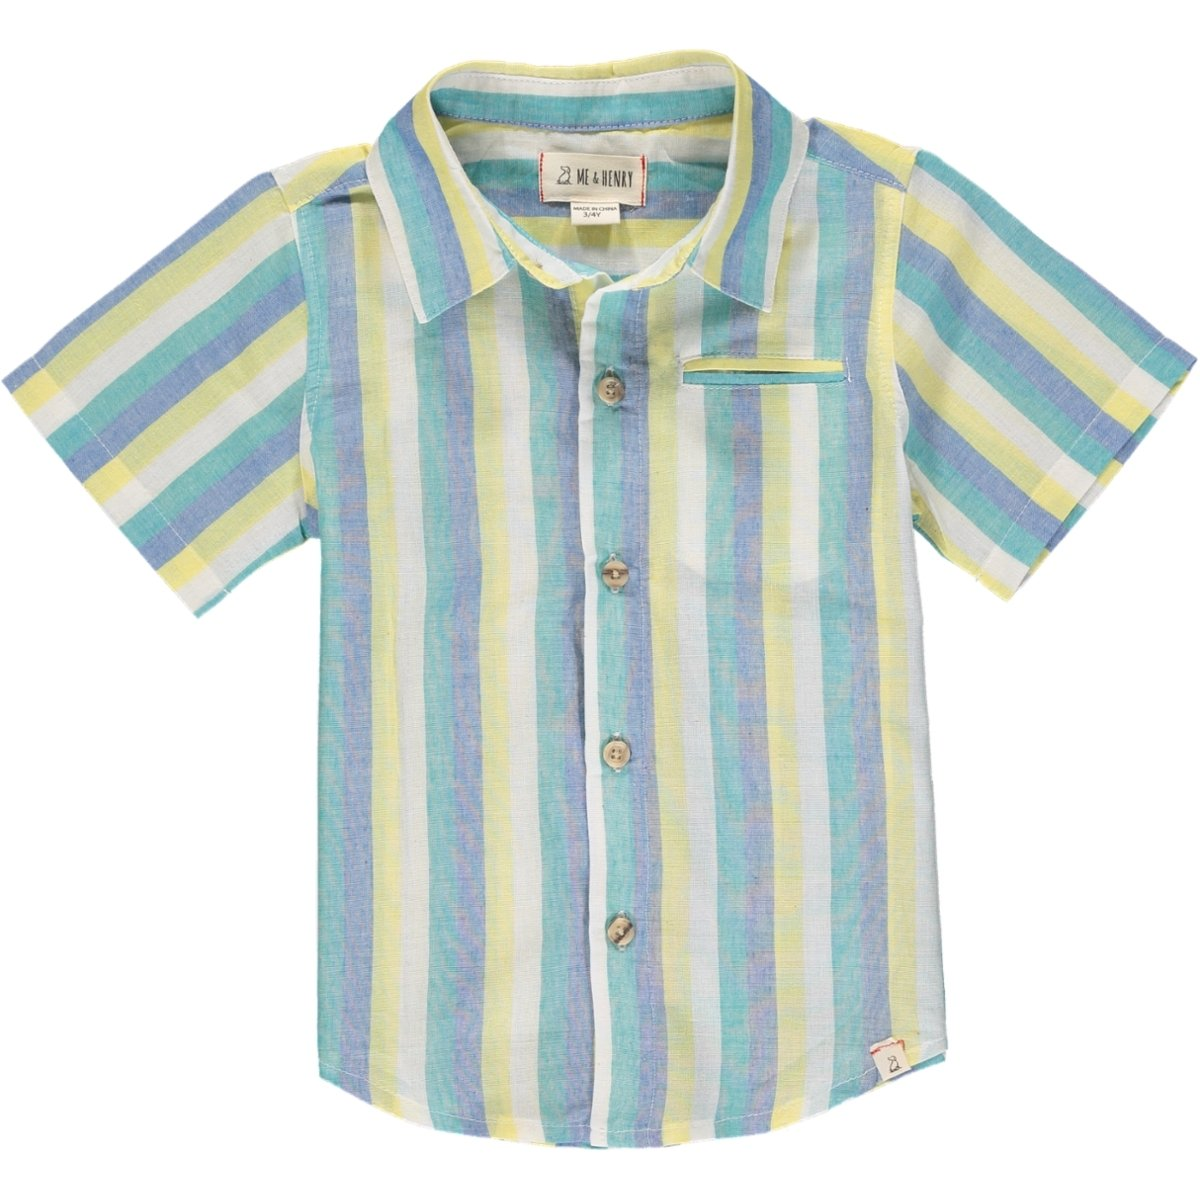 Pier Shirt in Green Stripe by Me + Henry